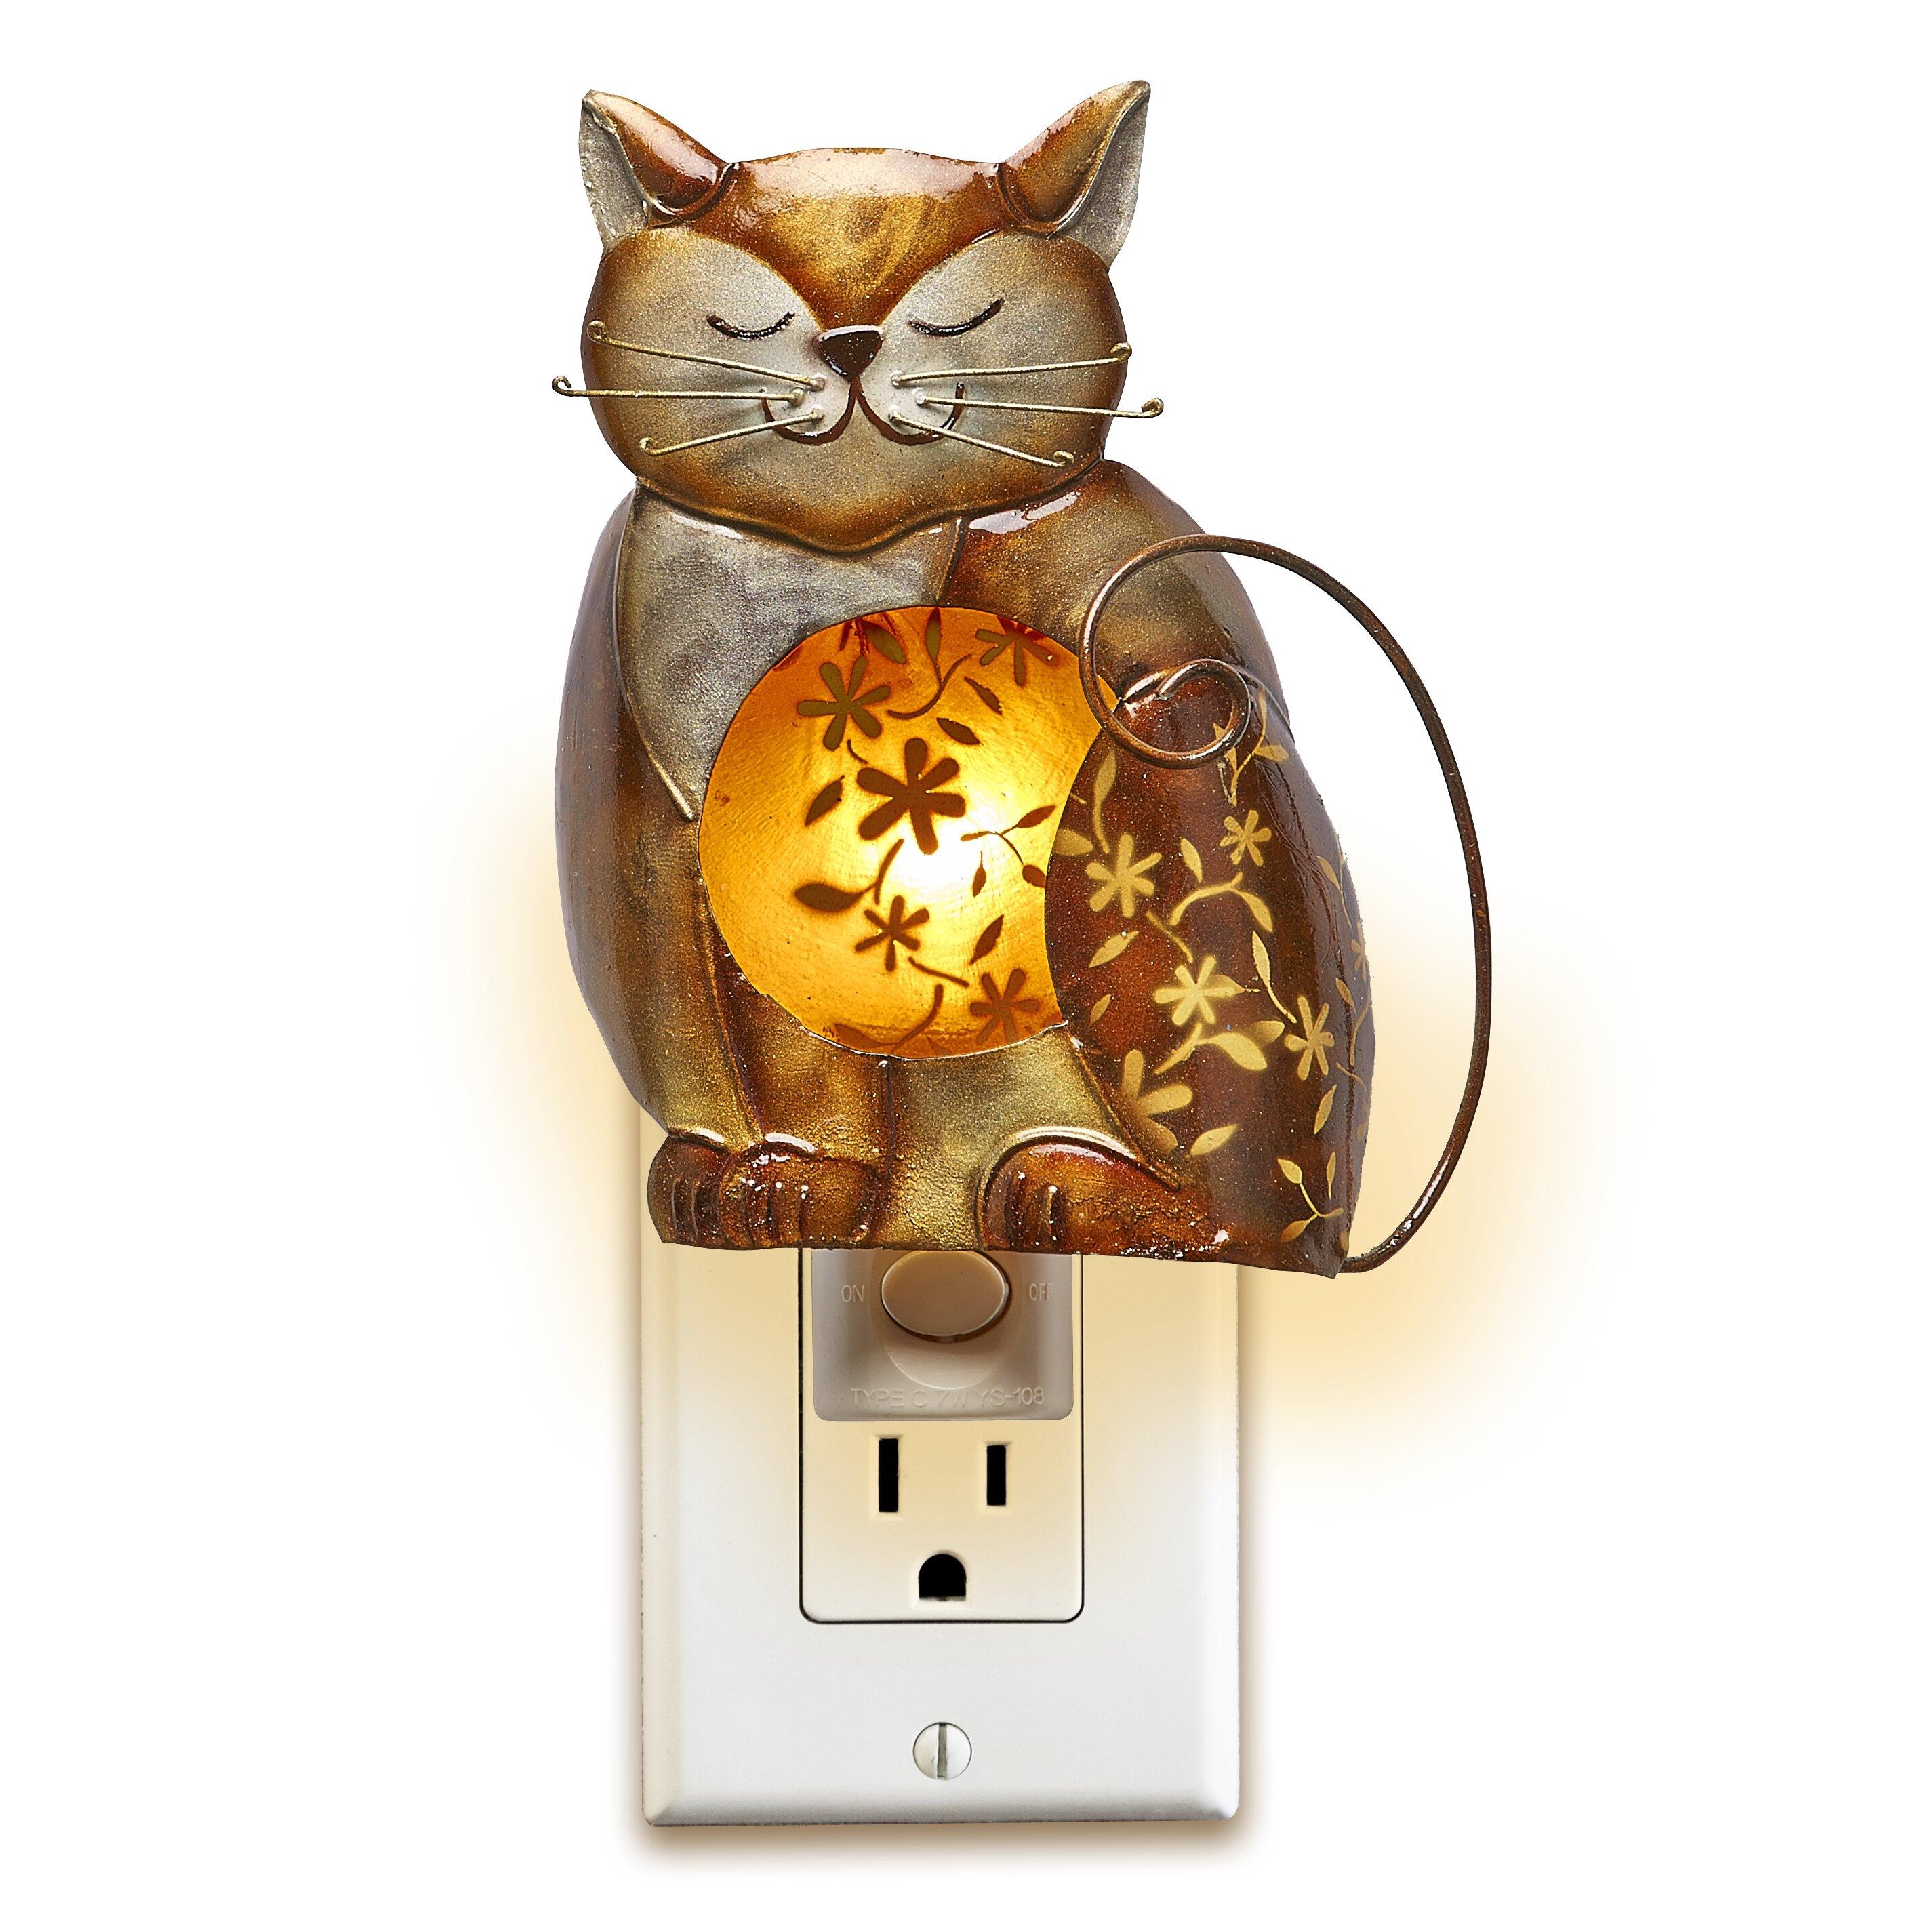 Automatic night lights decorative - Decobreeze Decor Cat Night Light